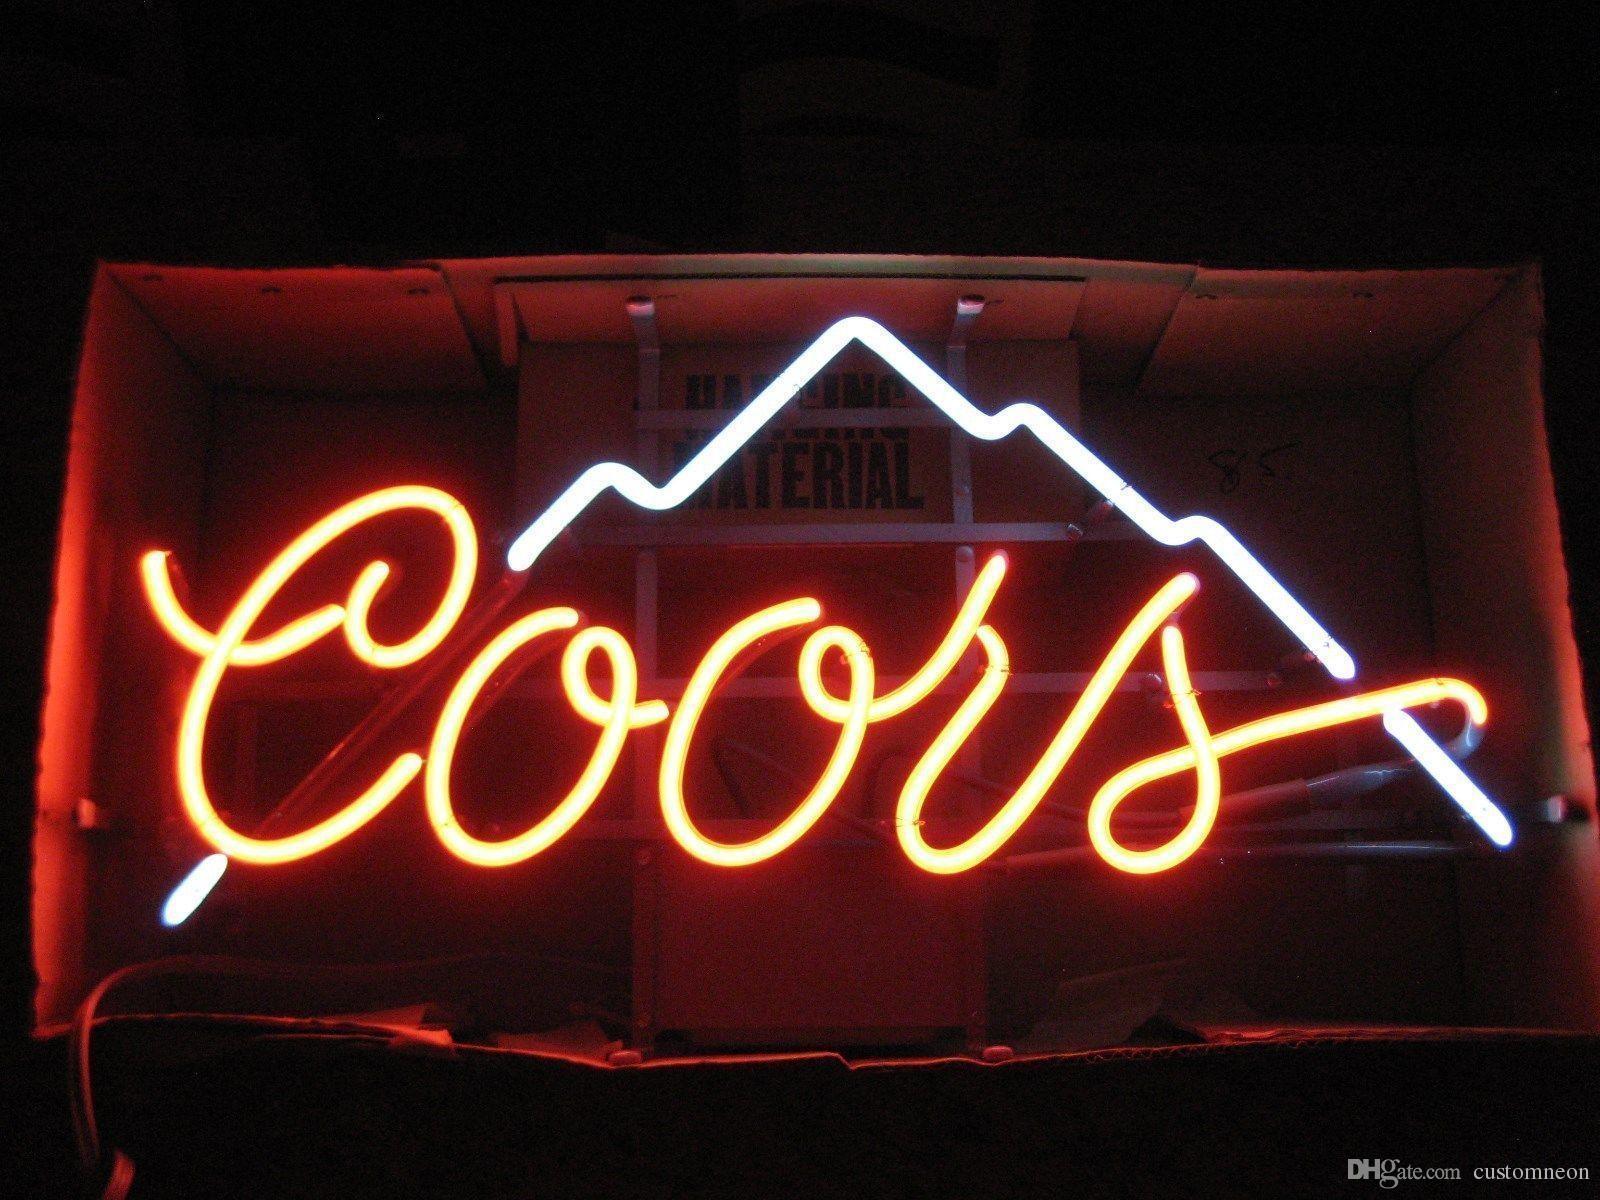 2020 17x14 Coors Light Mountain Vintage BEER BAR PUB CLUB